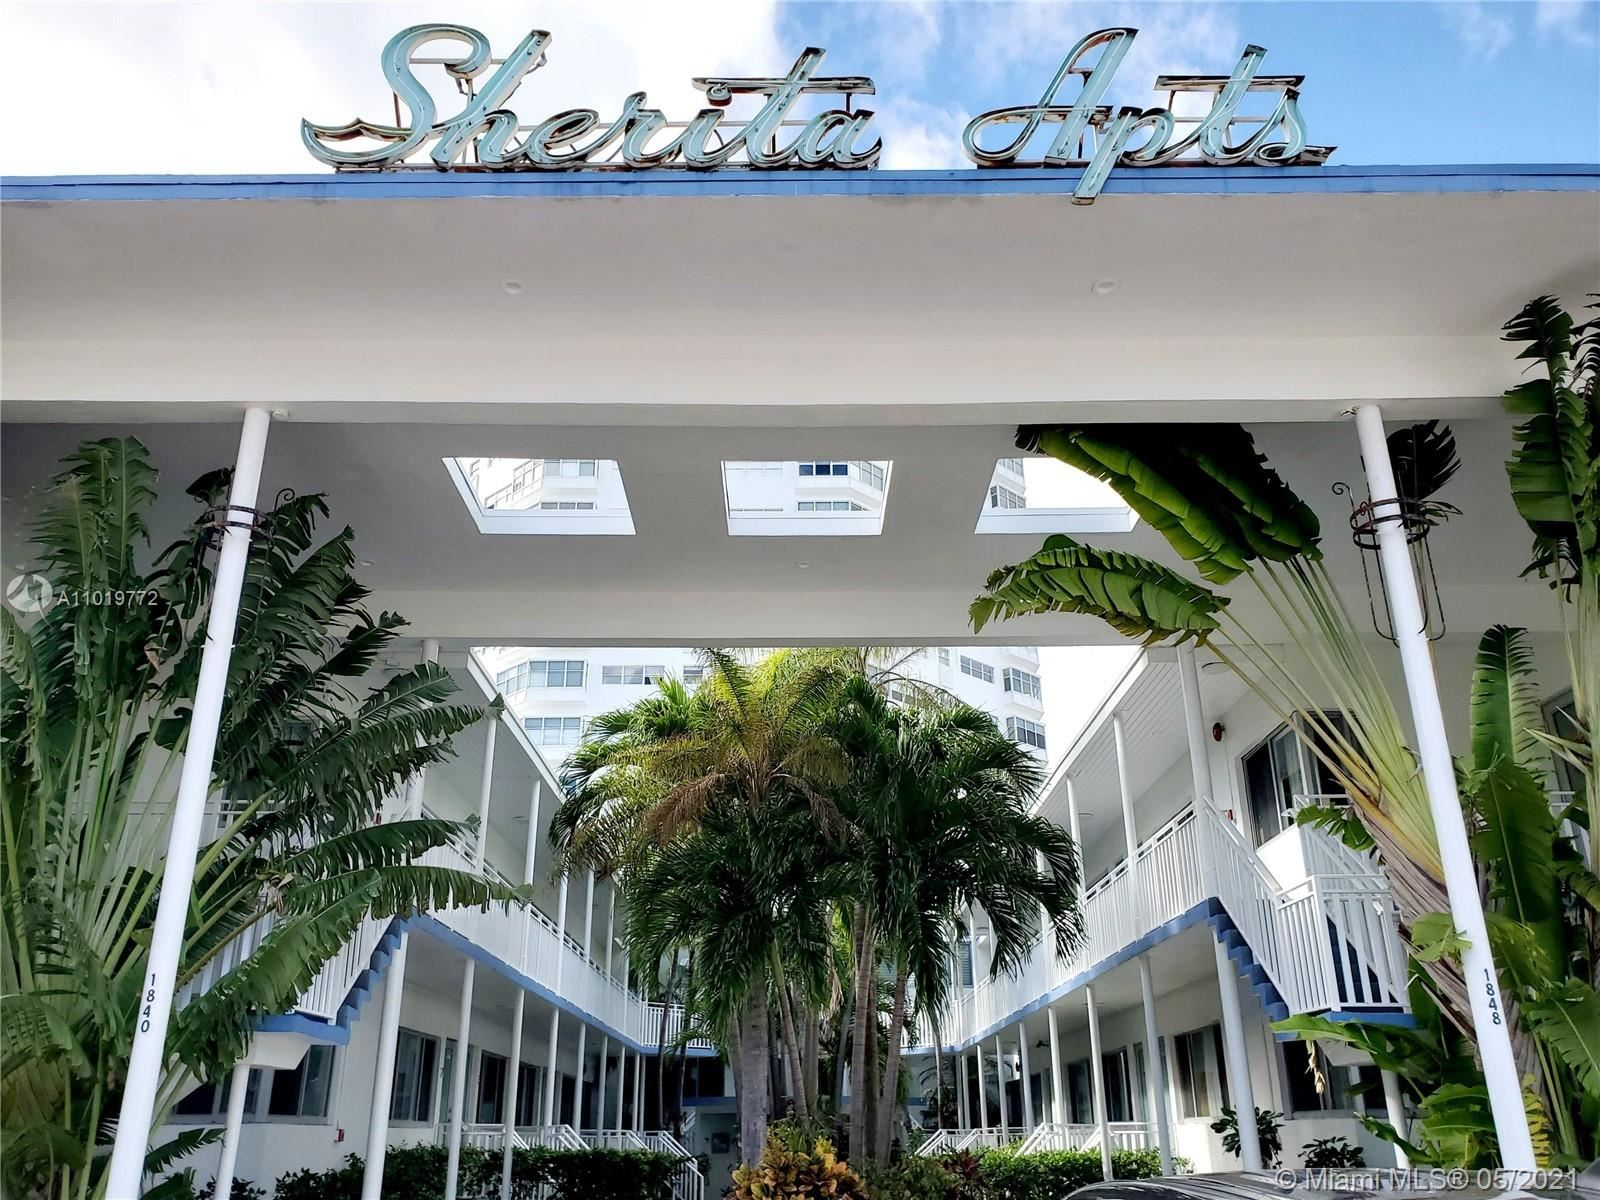 1840 James Ave #2, Miami Beach, FL 33139 - #: A11019772